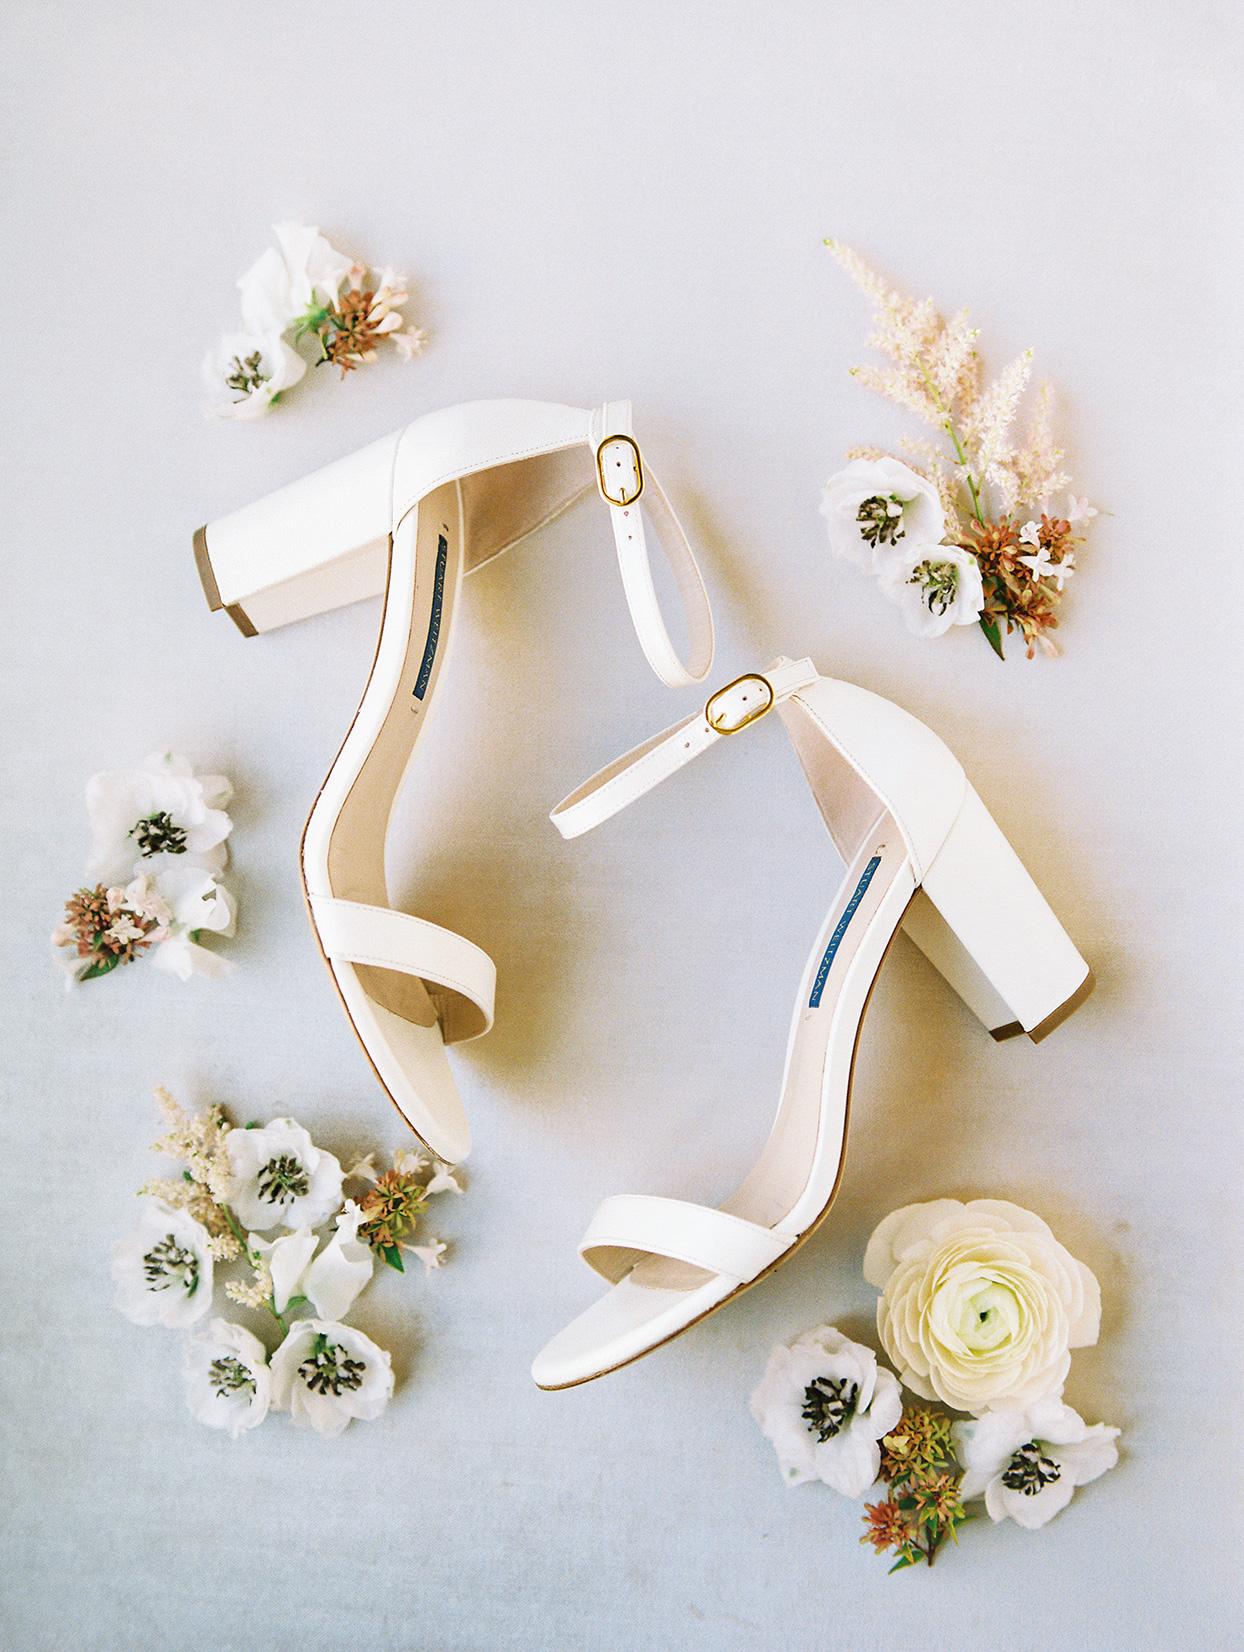 bride's simple cream colored wedding shoes